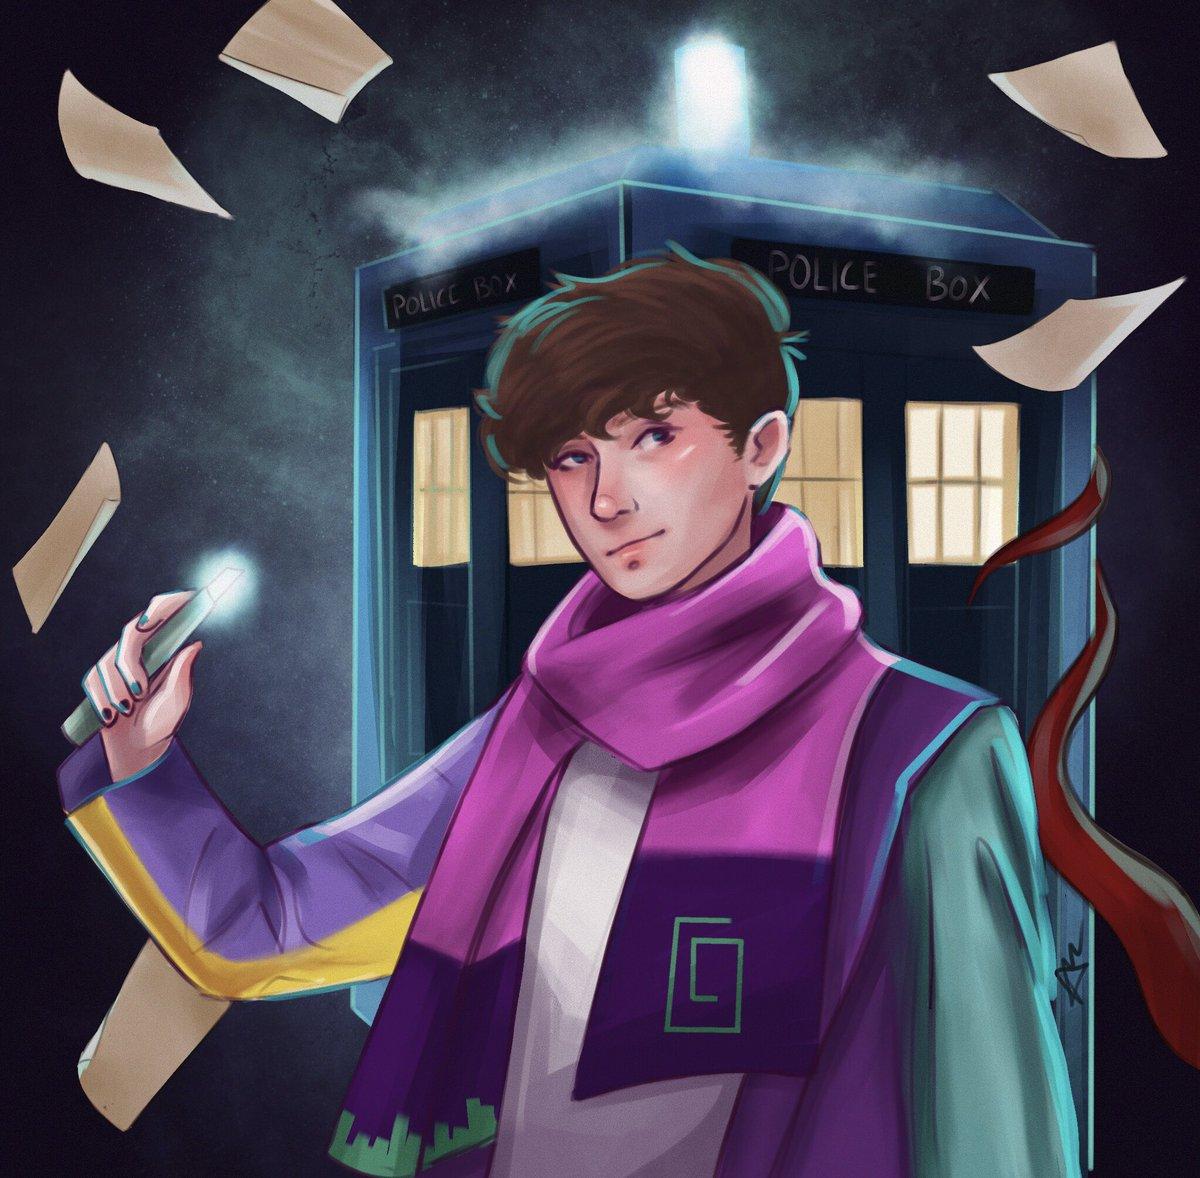 karl but he's the doctor #TALESFROMTHESMPfanart #TALESFROMTHESMP